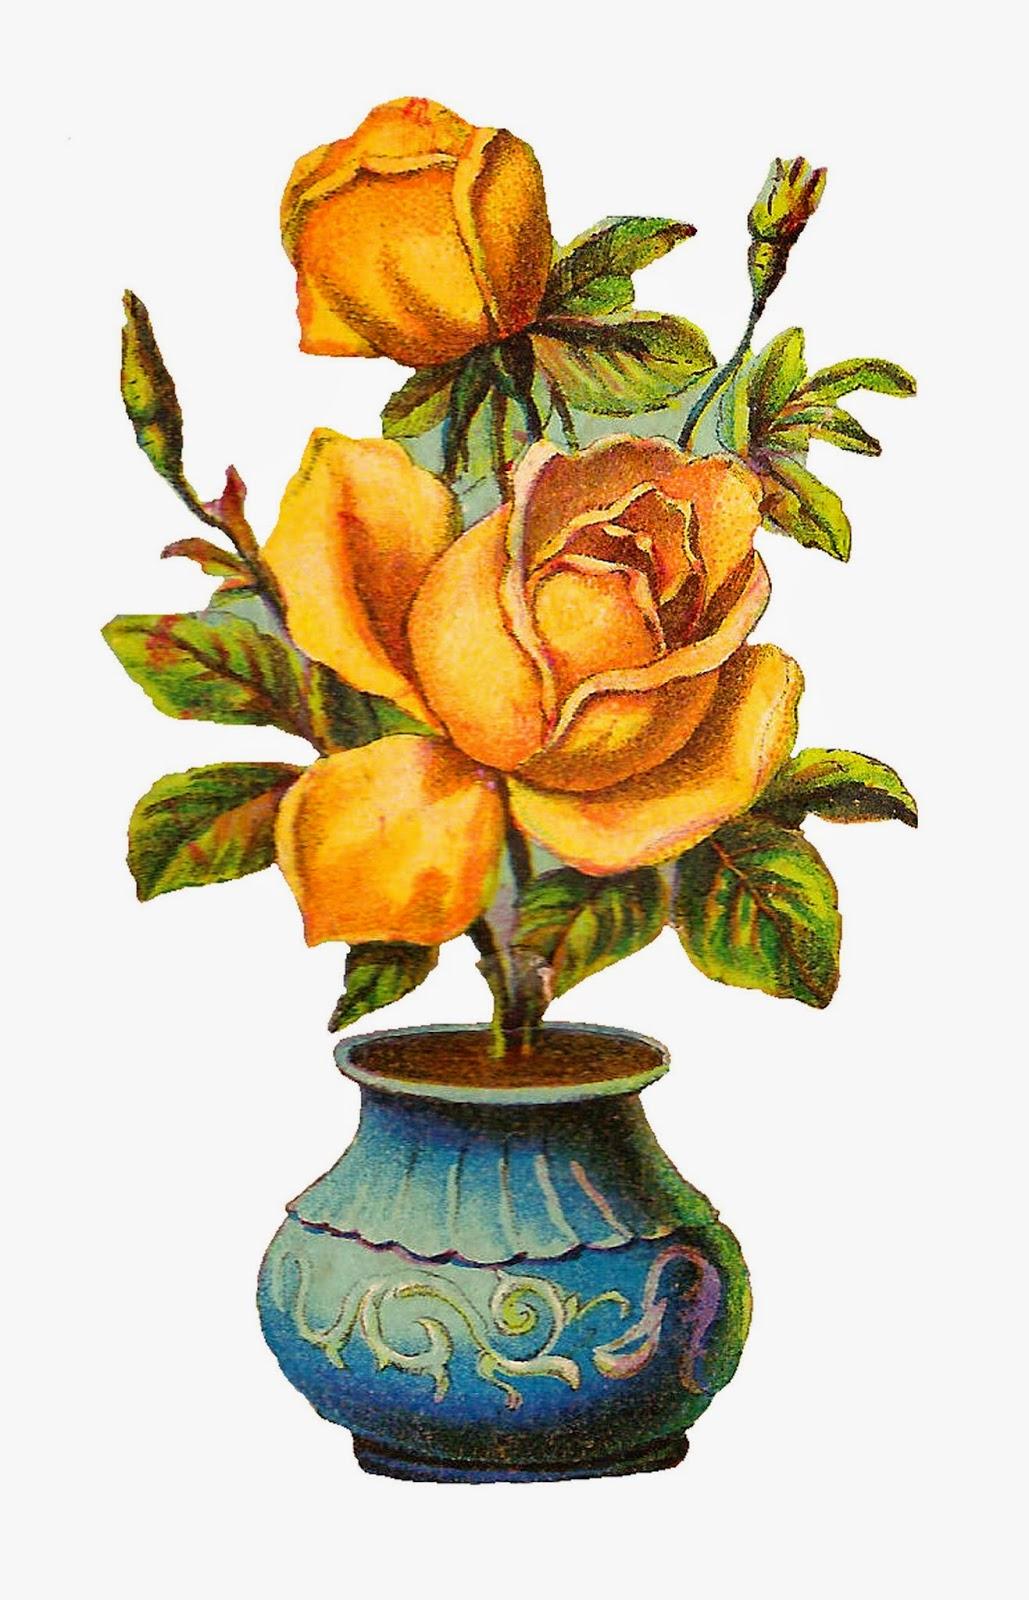 Antique Images Vintage Botanical Yellow Rose Digital Download With